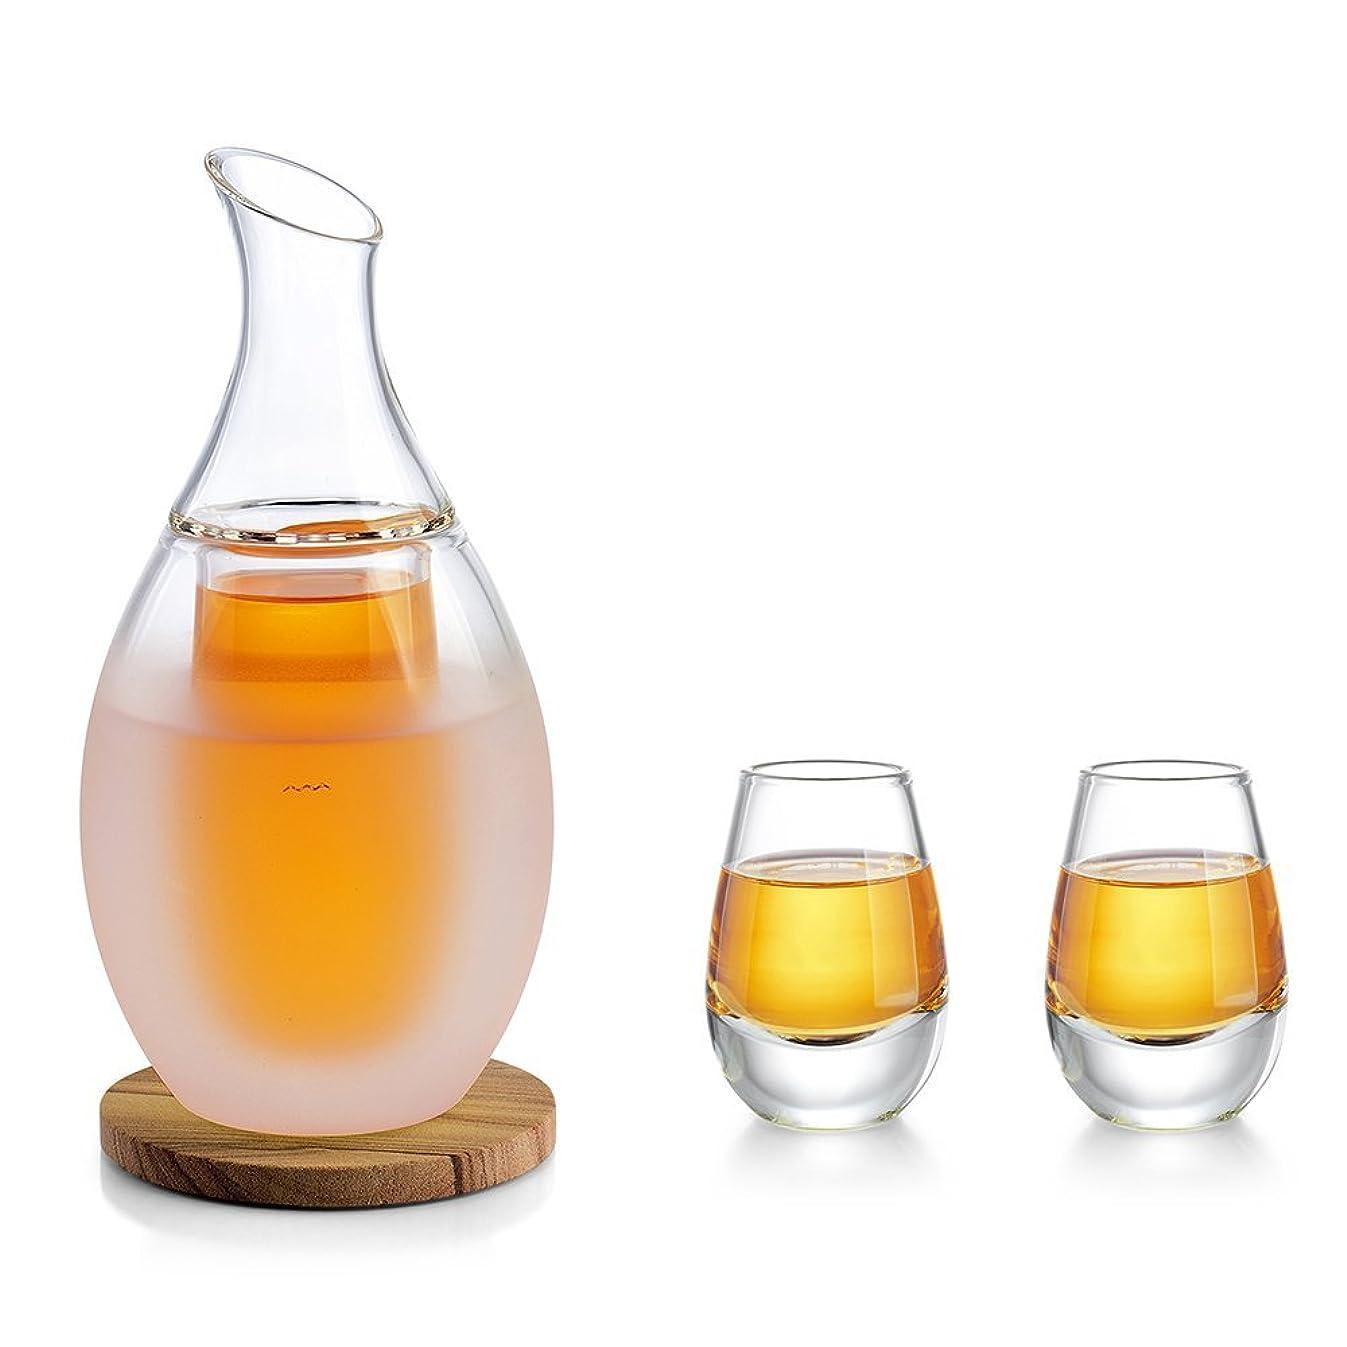 ZENS Sake Warmer Set,Sake Glasses Drinking Set with 2 Sake Cups,Sake Decanter Gift Set for Cold/Warm/Hot Sake liquor with Coasters and Towel